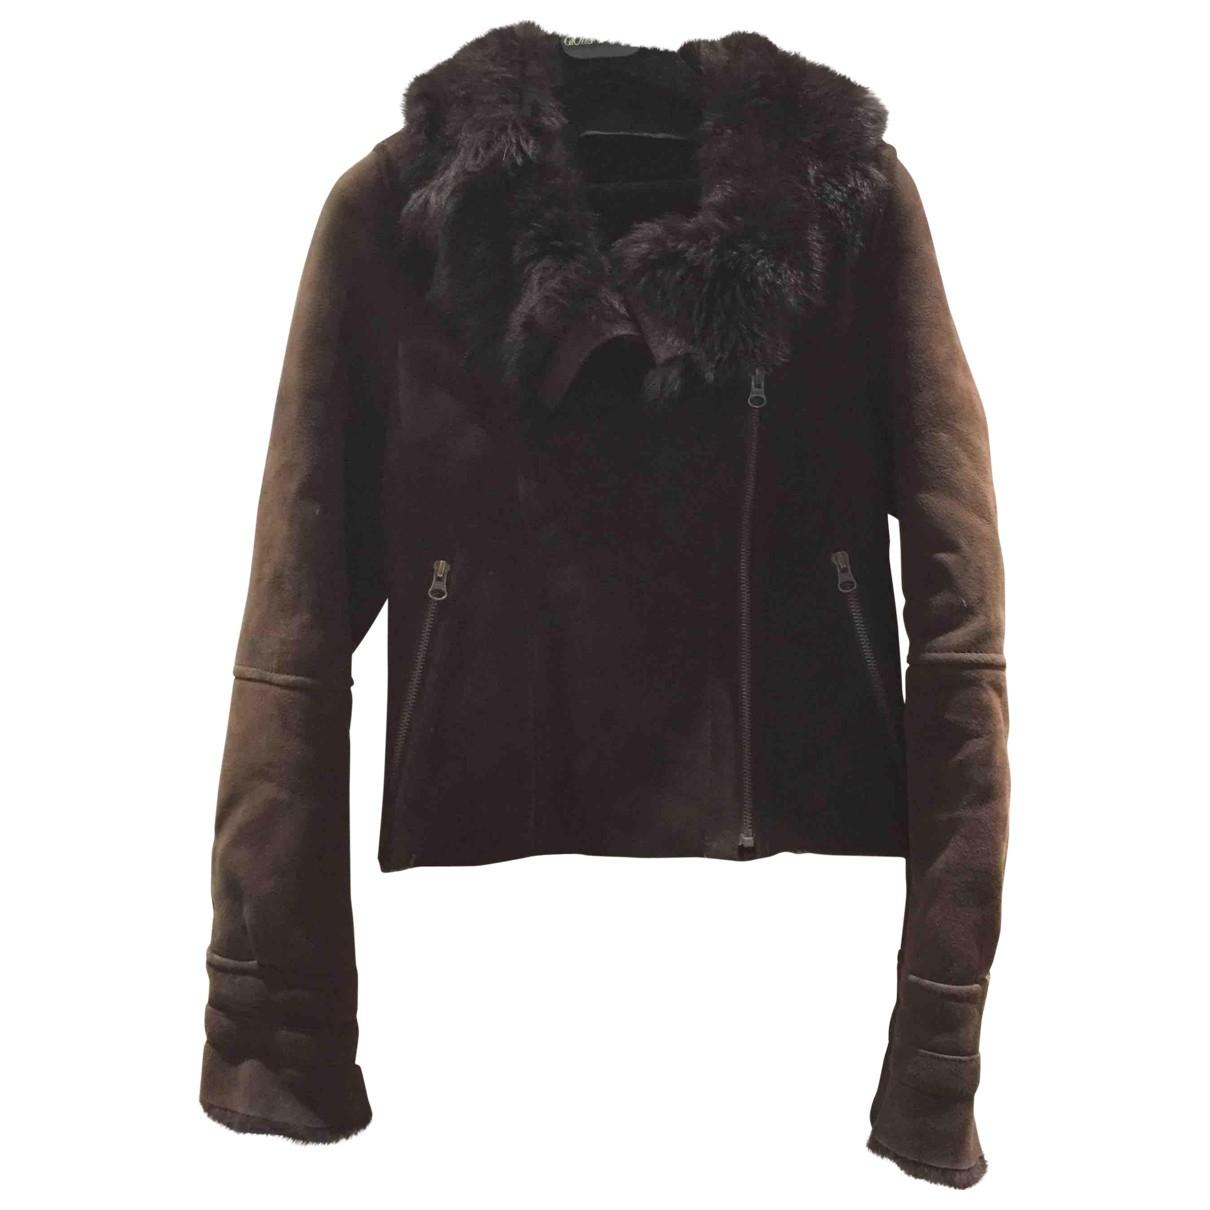 Zara N Brown Leather jacket for Women S International